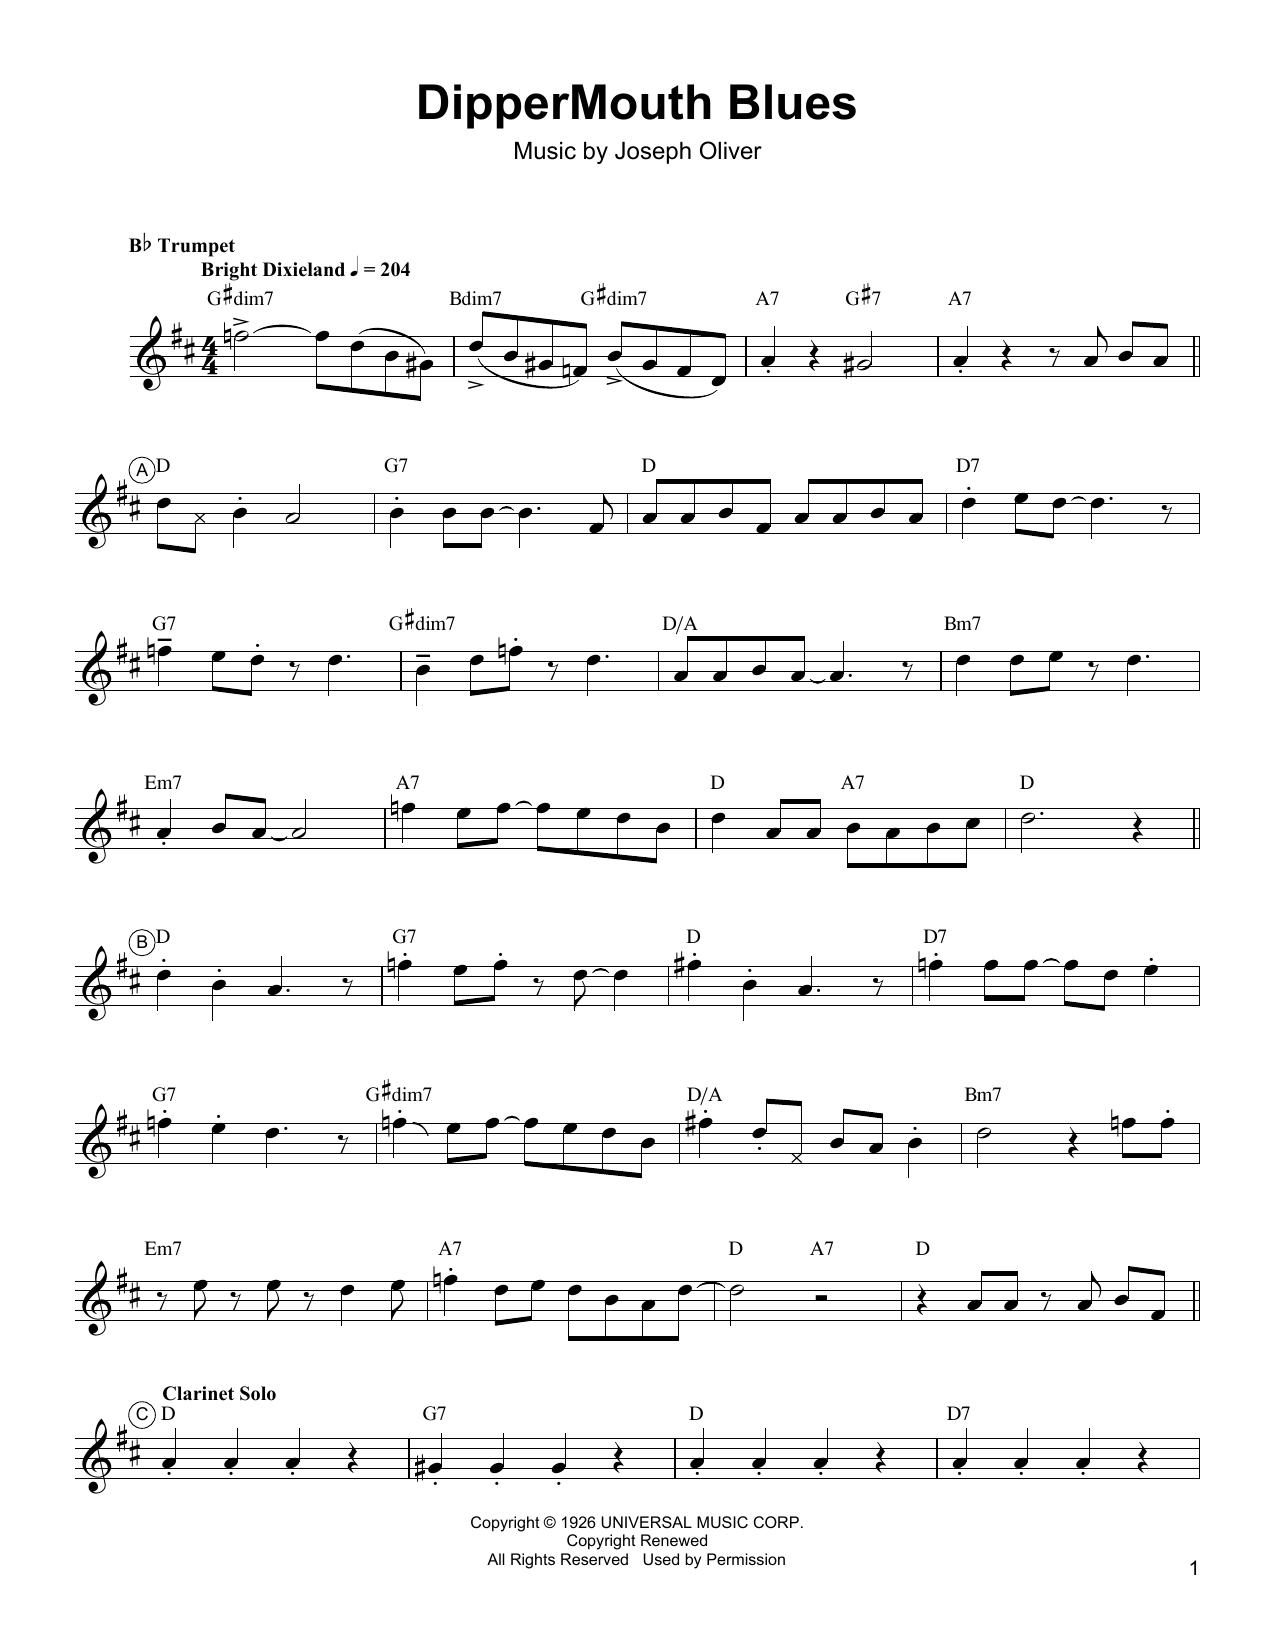 Arturo Sandoval Dippermouth Blues Sheet Music Notes Chords